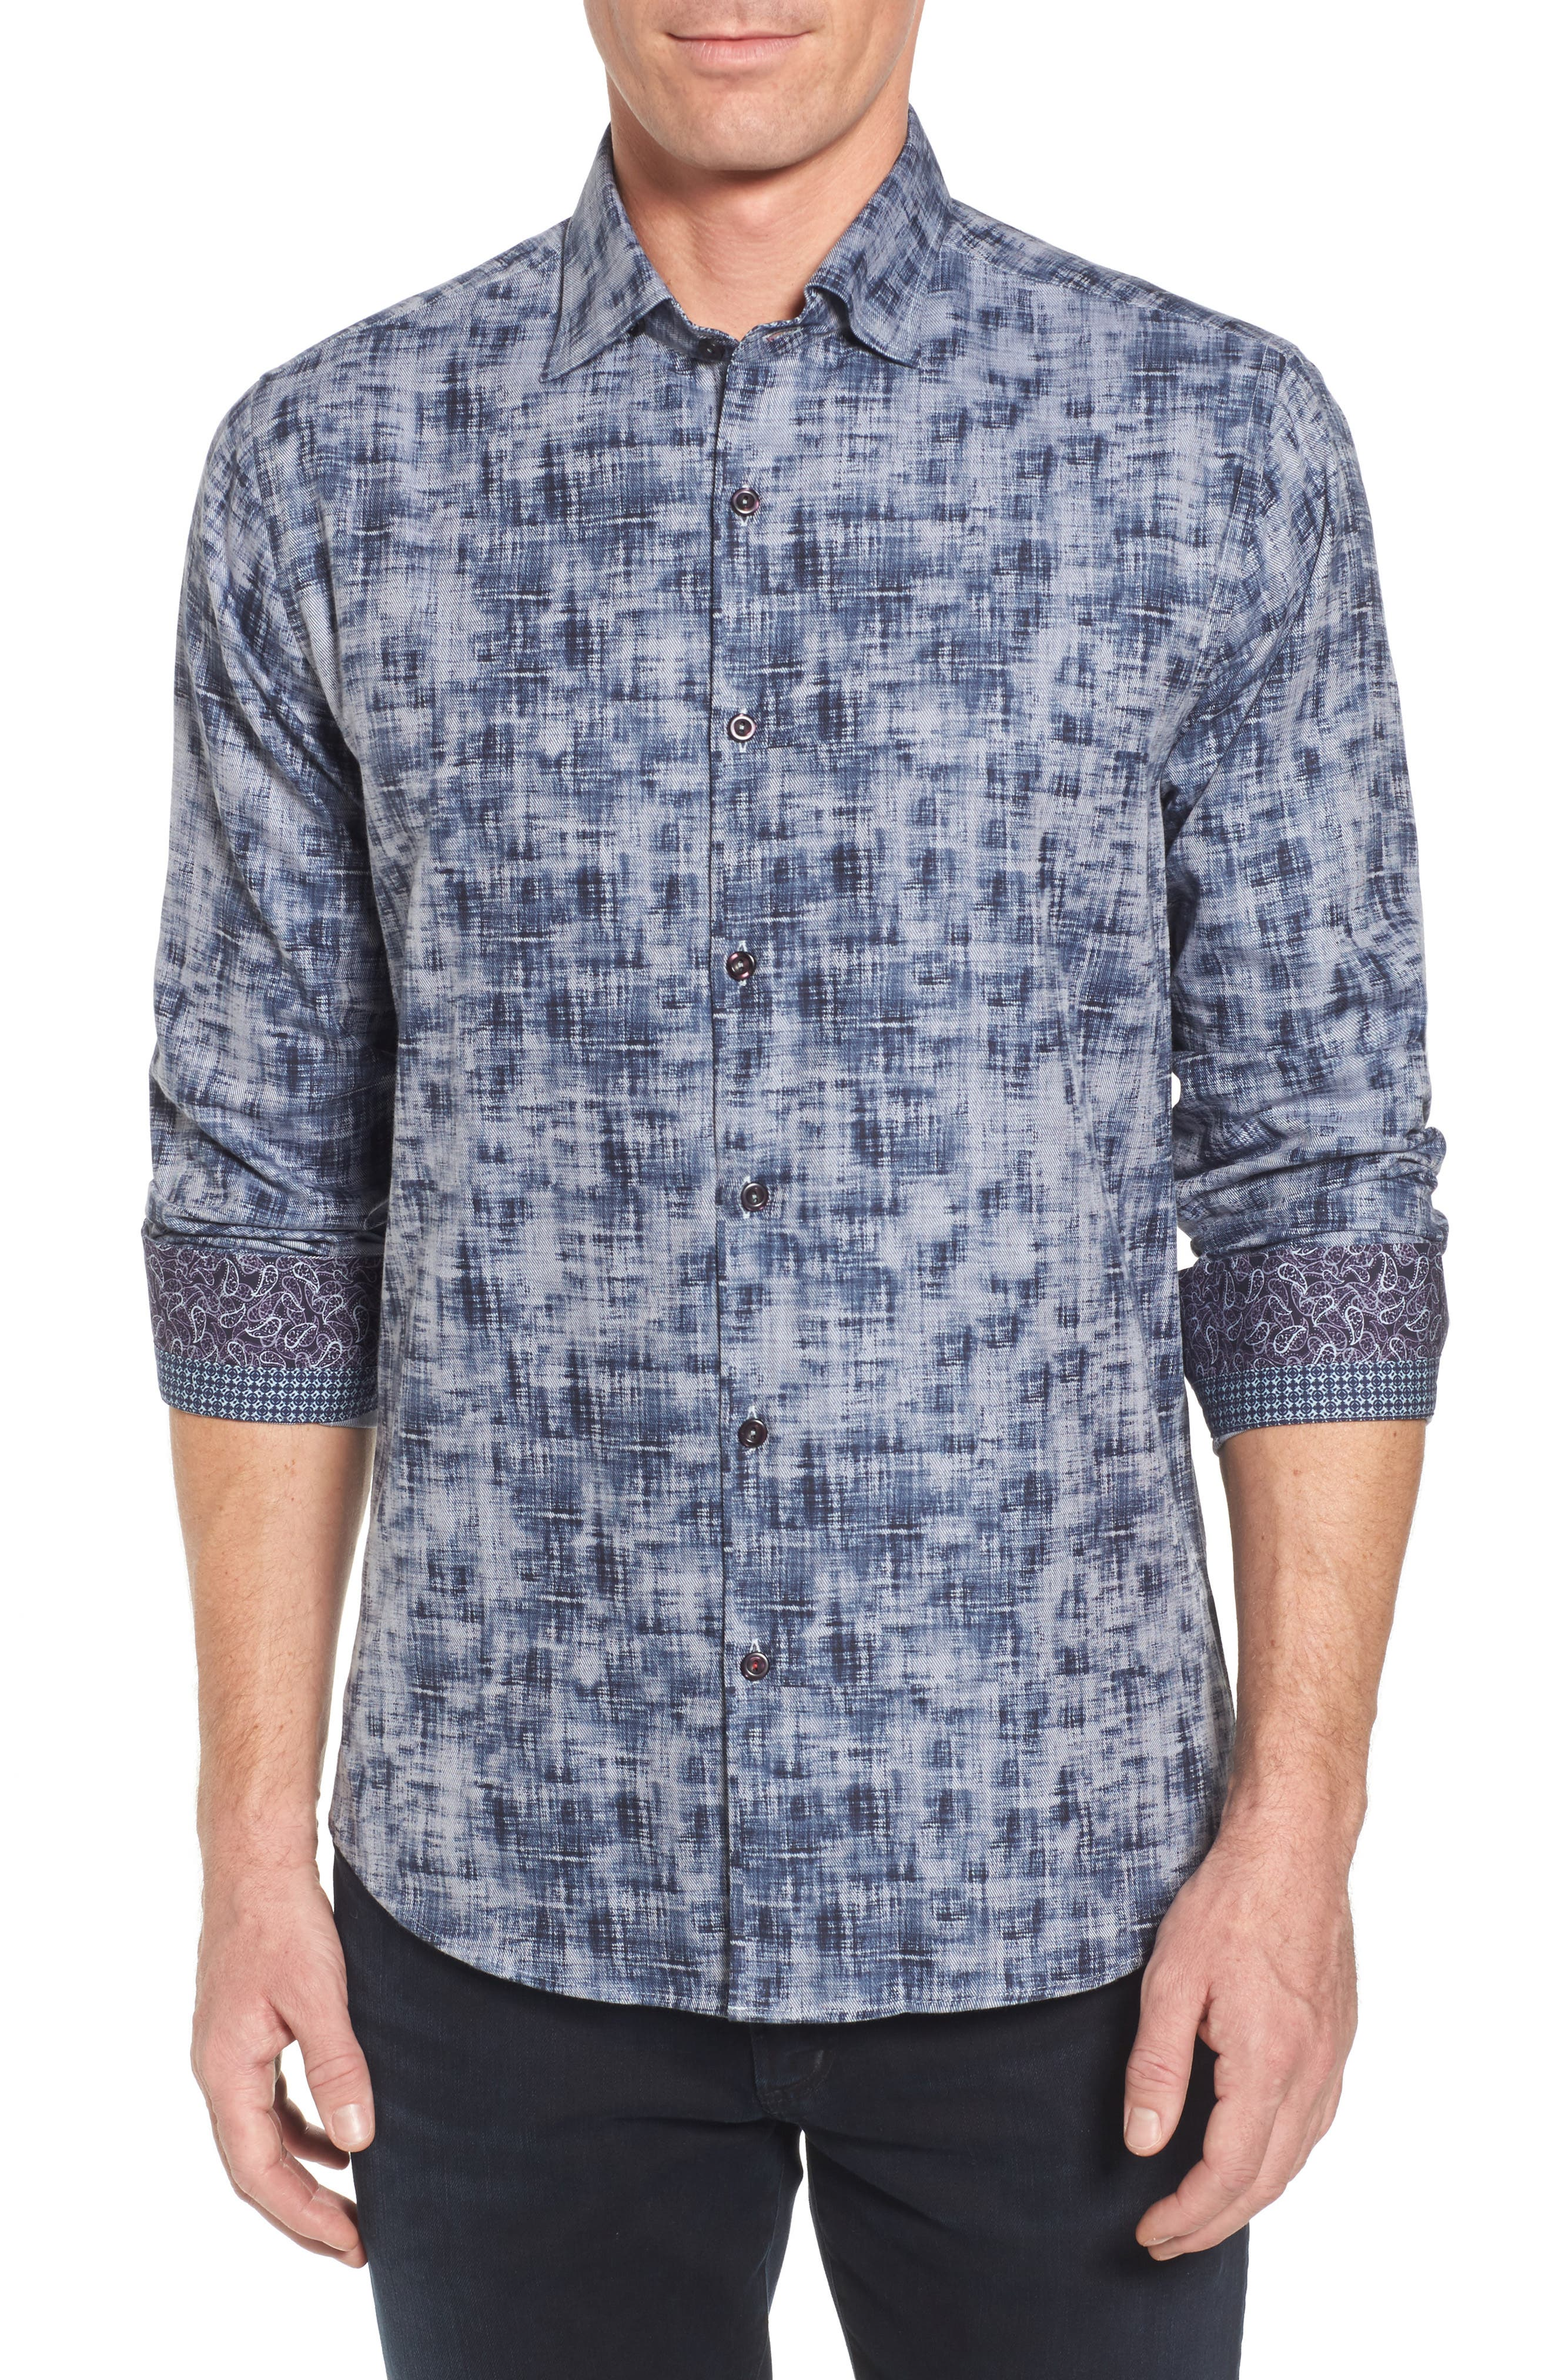 Alternate Image 1 Selected - Stone Rose Slim Fit Twill FX Print Sport Shirt